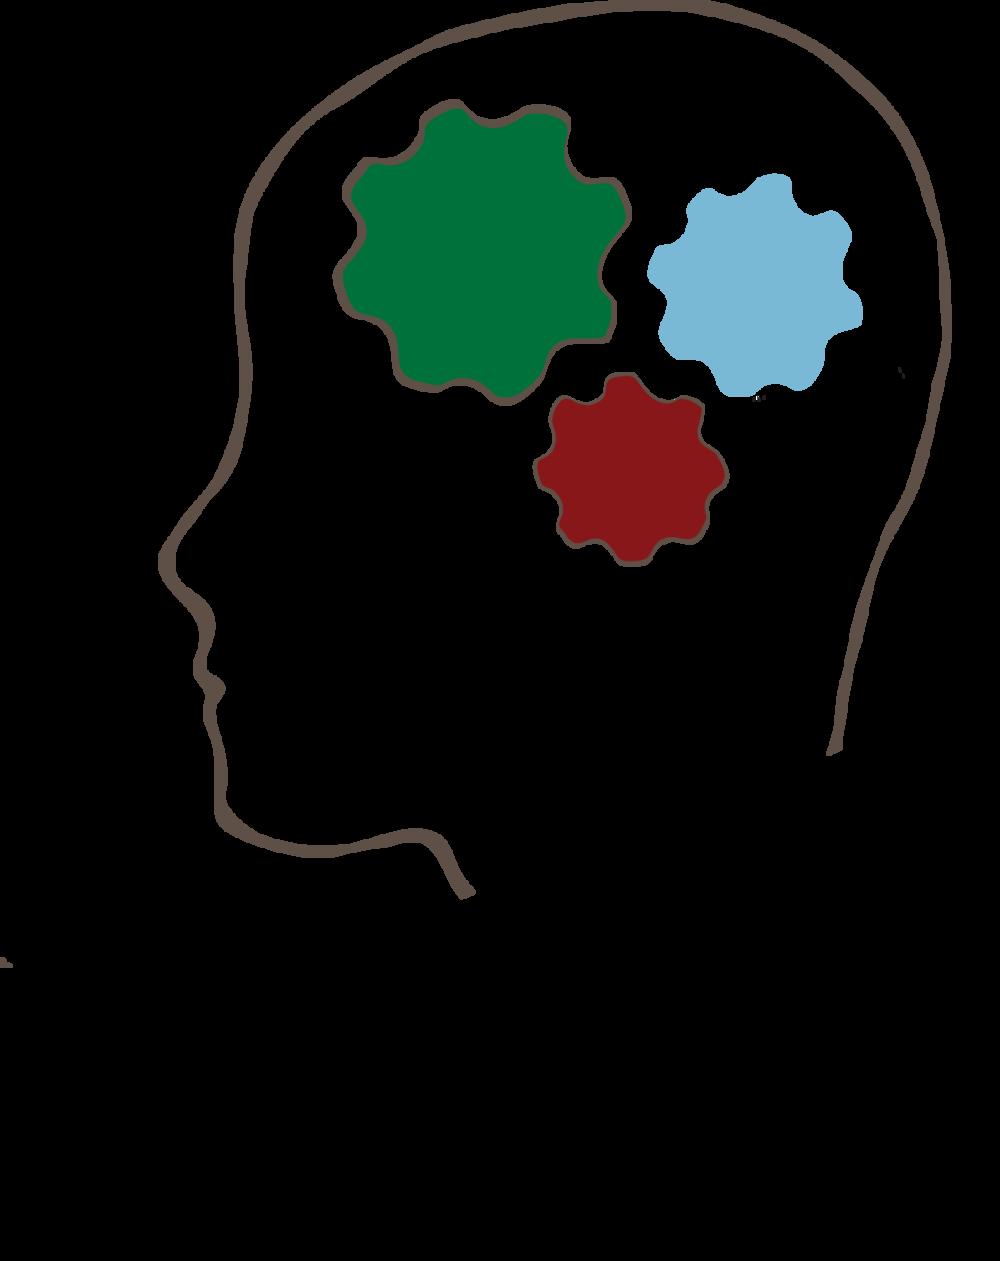 brain by owen keturah for bonafide provisions